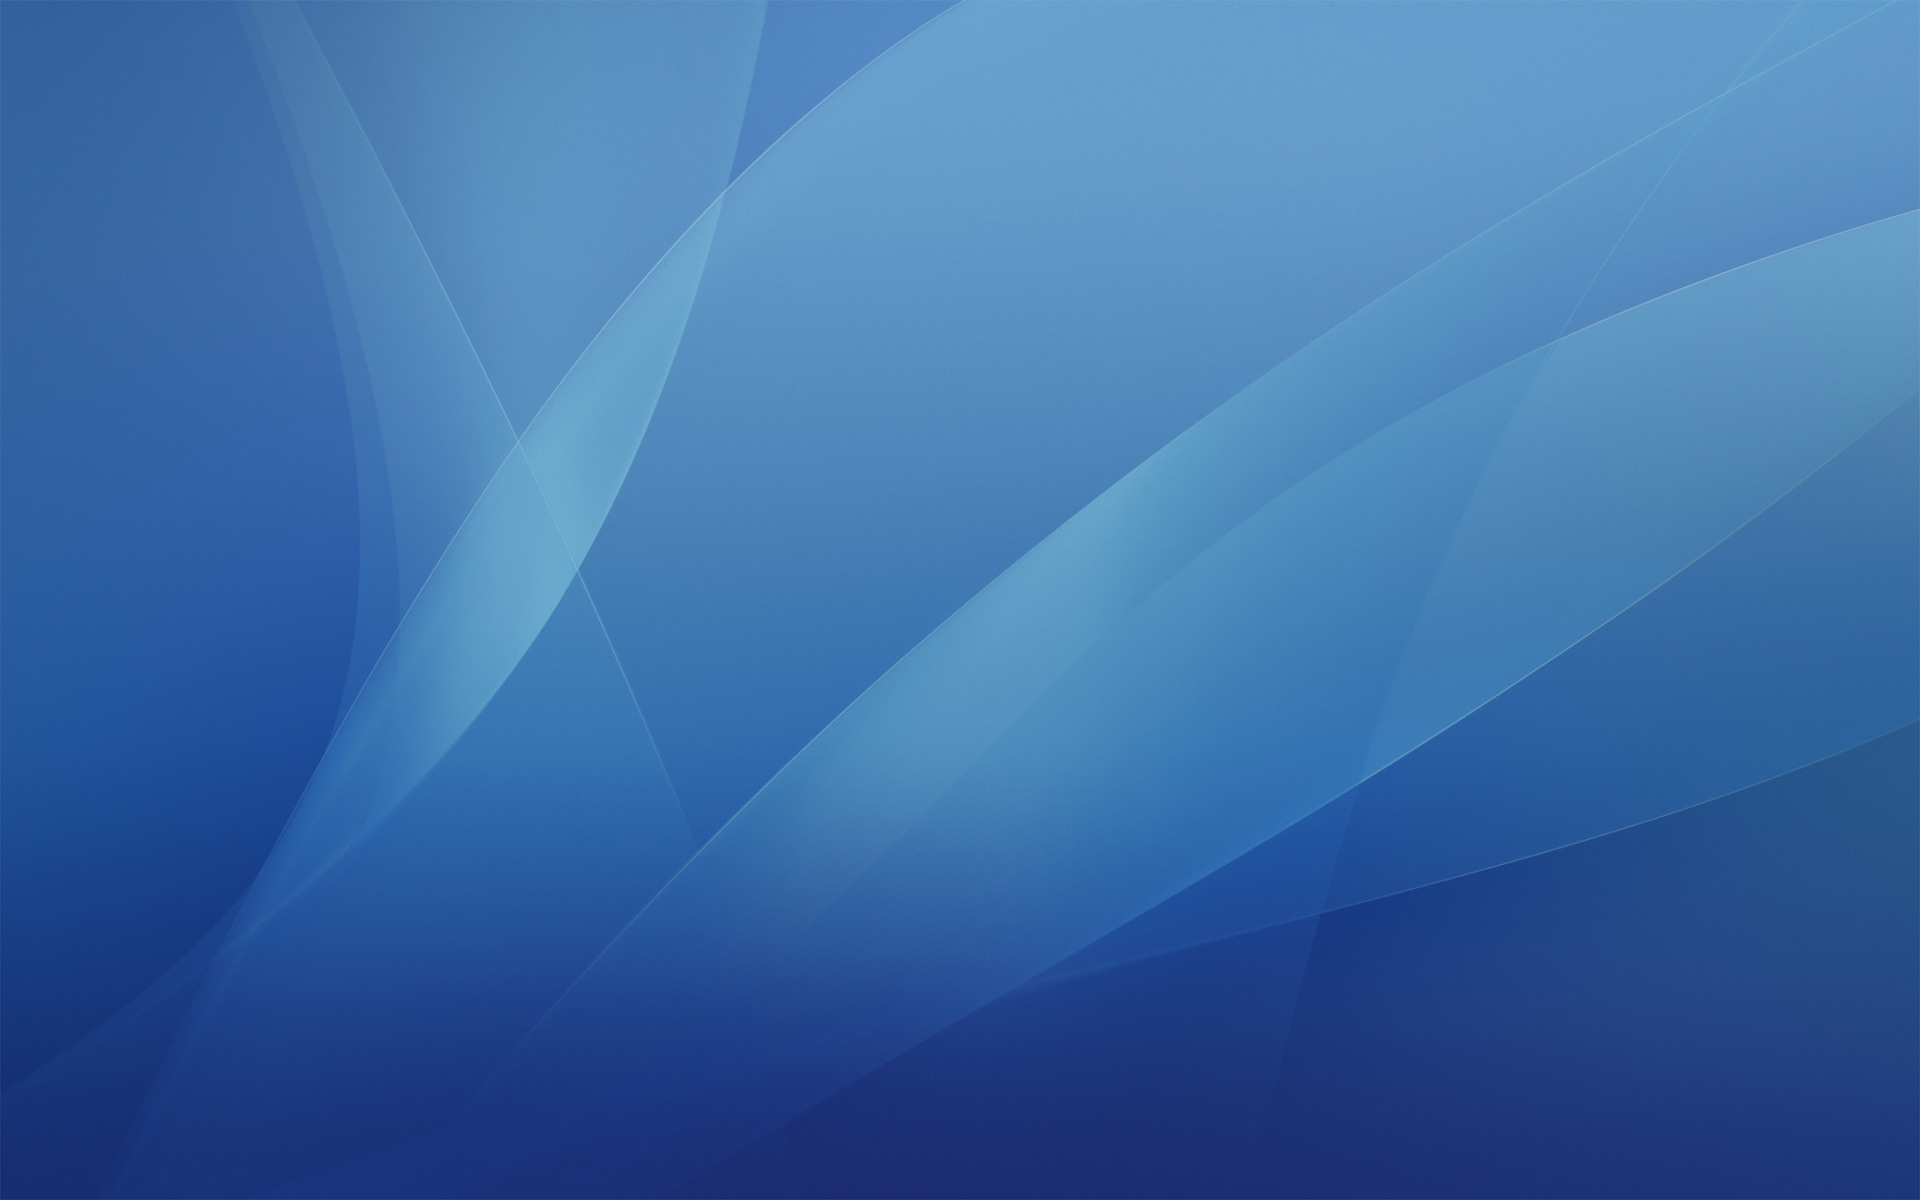 8k Animal Wallpaper Download: Tiger Wallpapers And Desktop Backgrounds Up To 8K